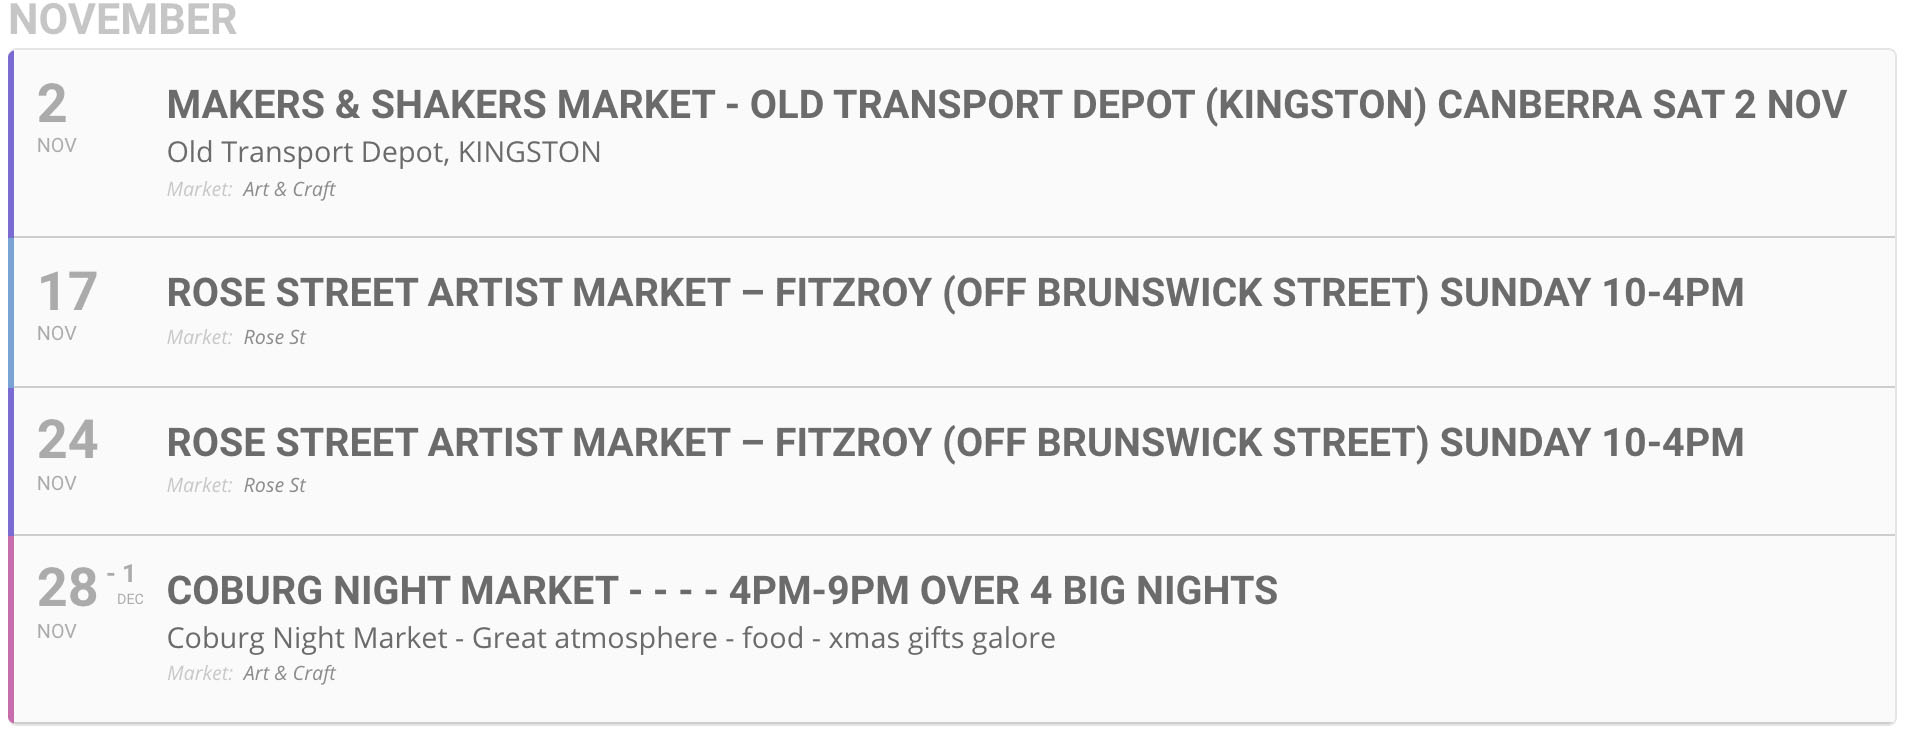 market dates november